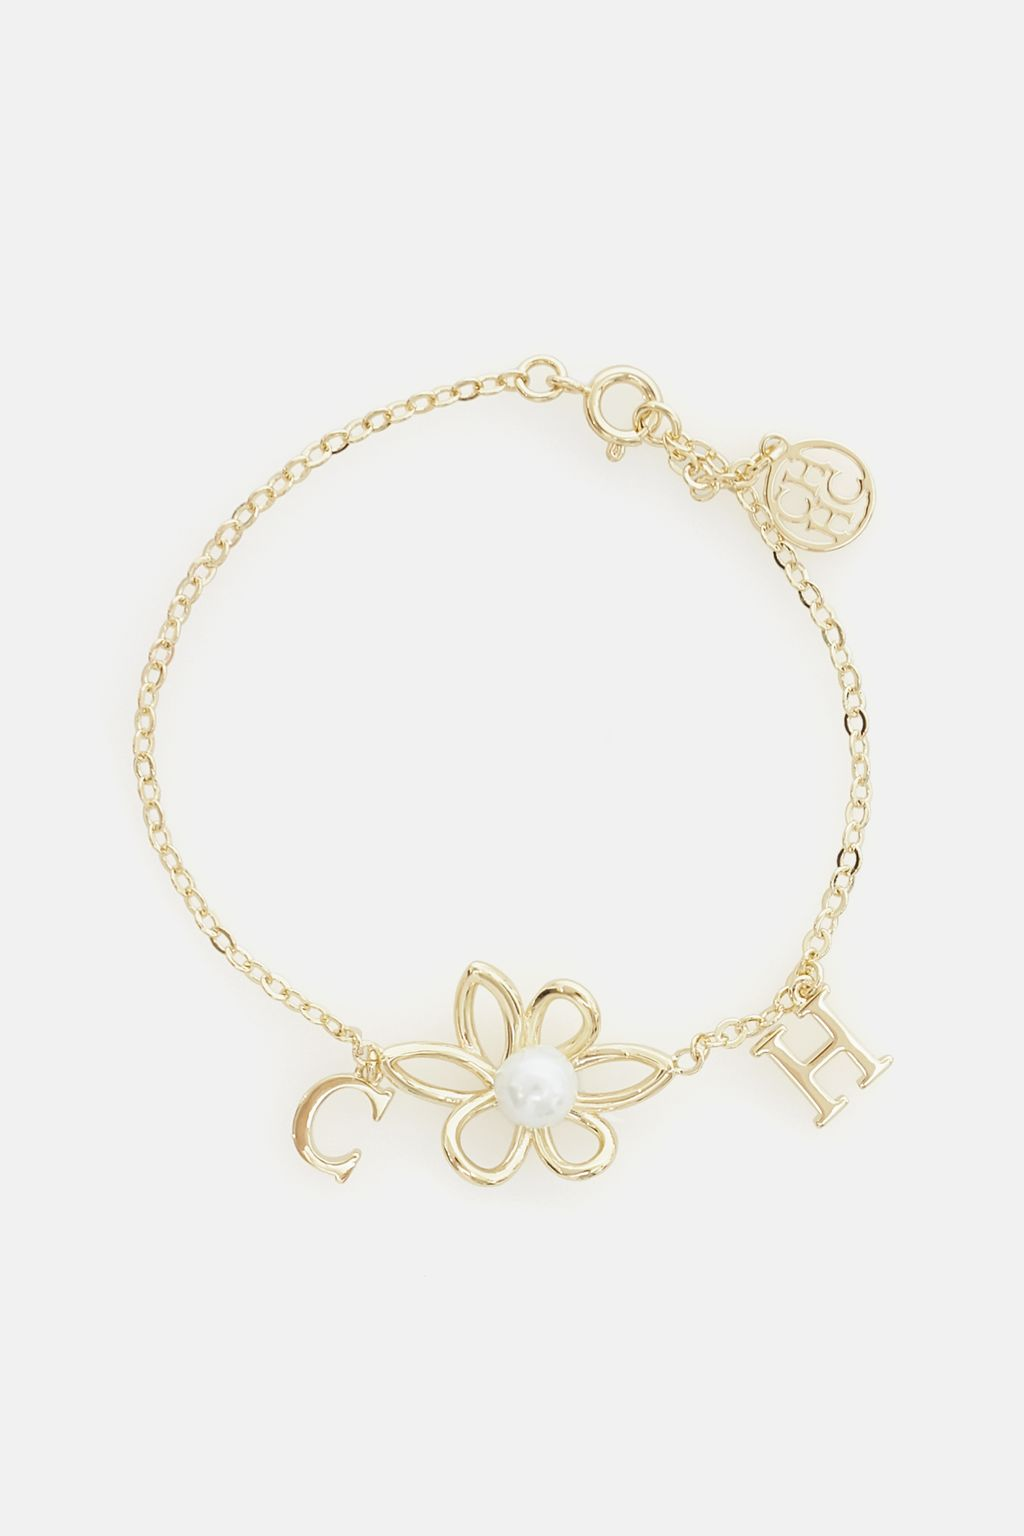 Jasmine Silhouette bracelet